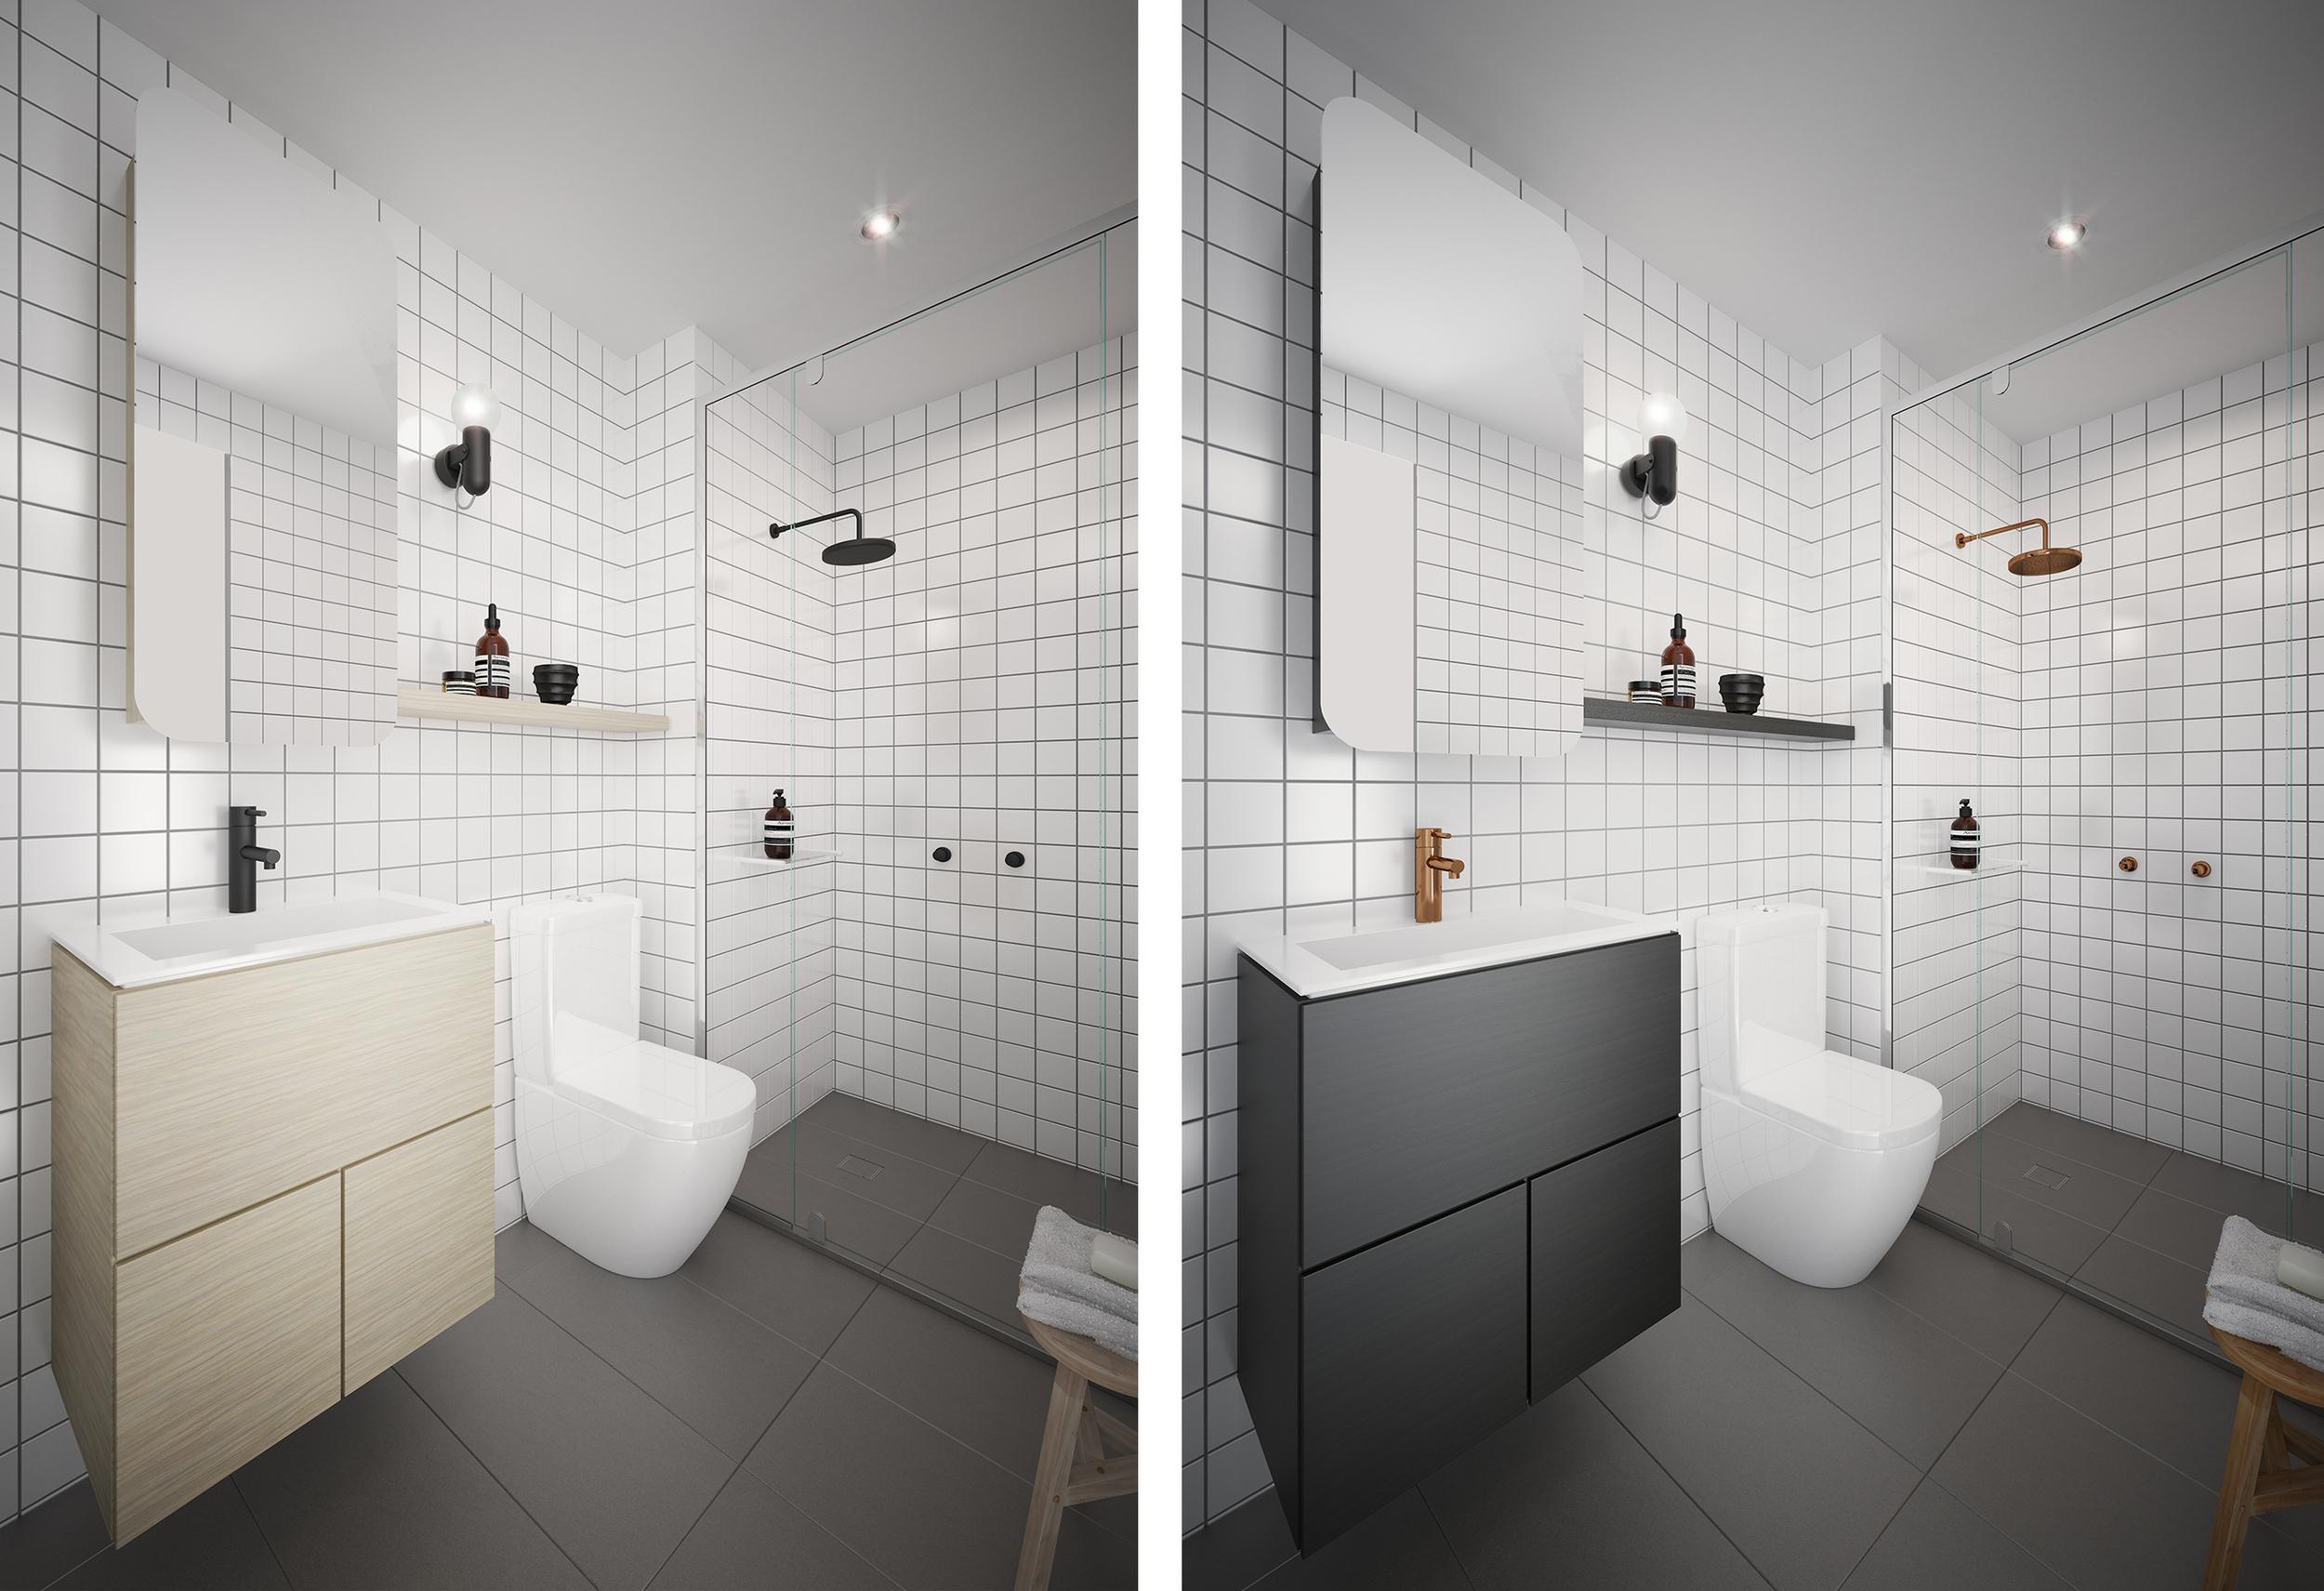 Bathroom design by Chamberlain Architects